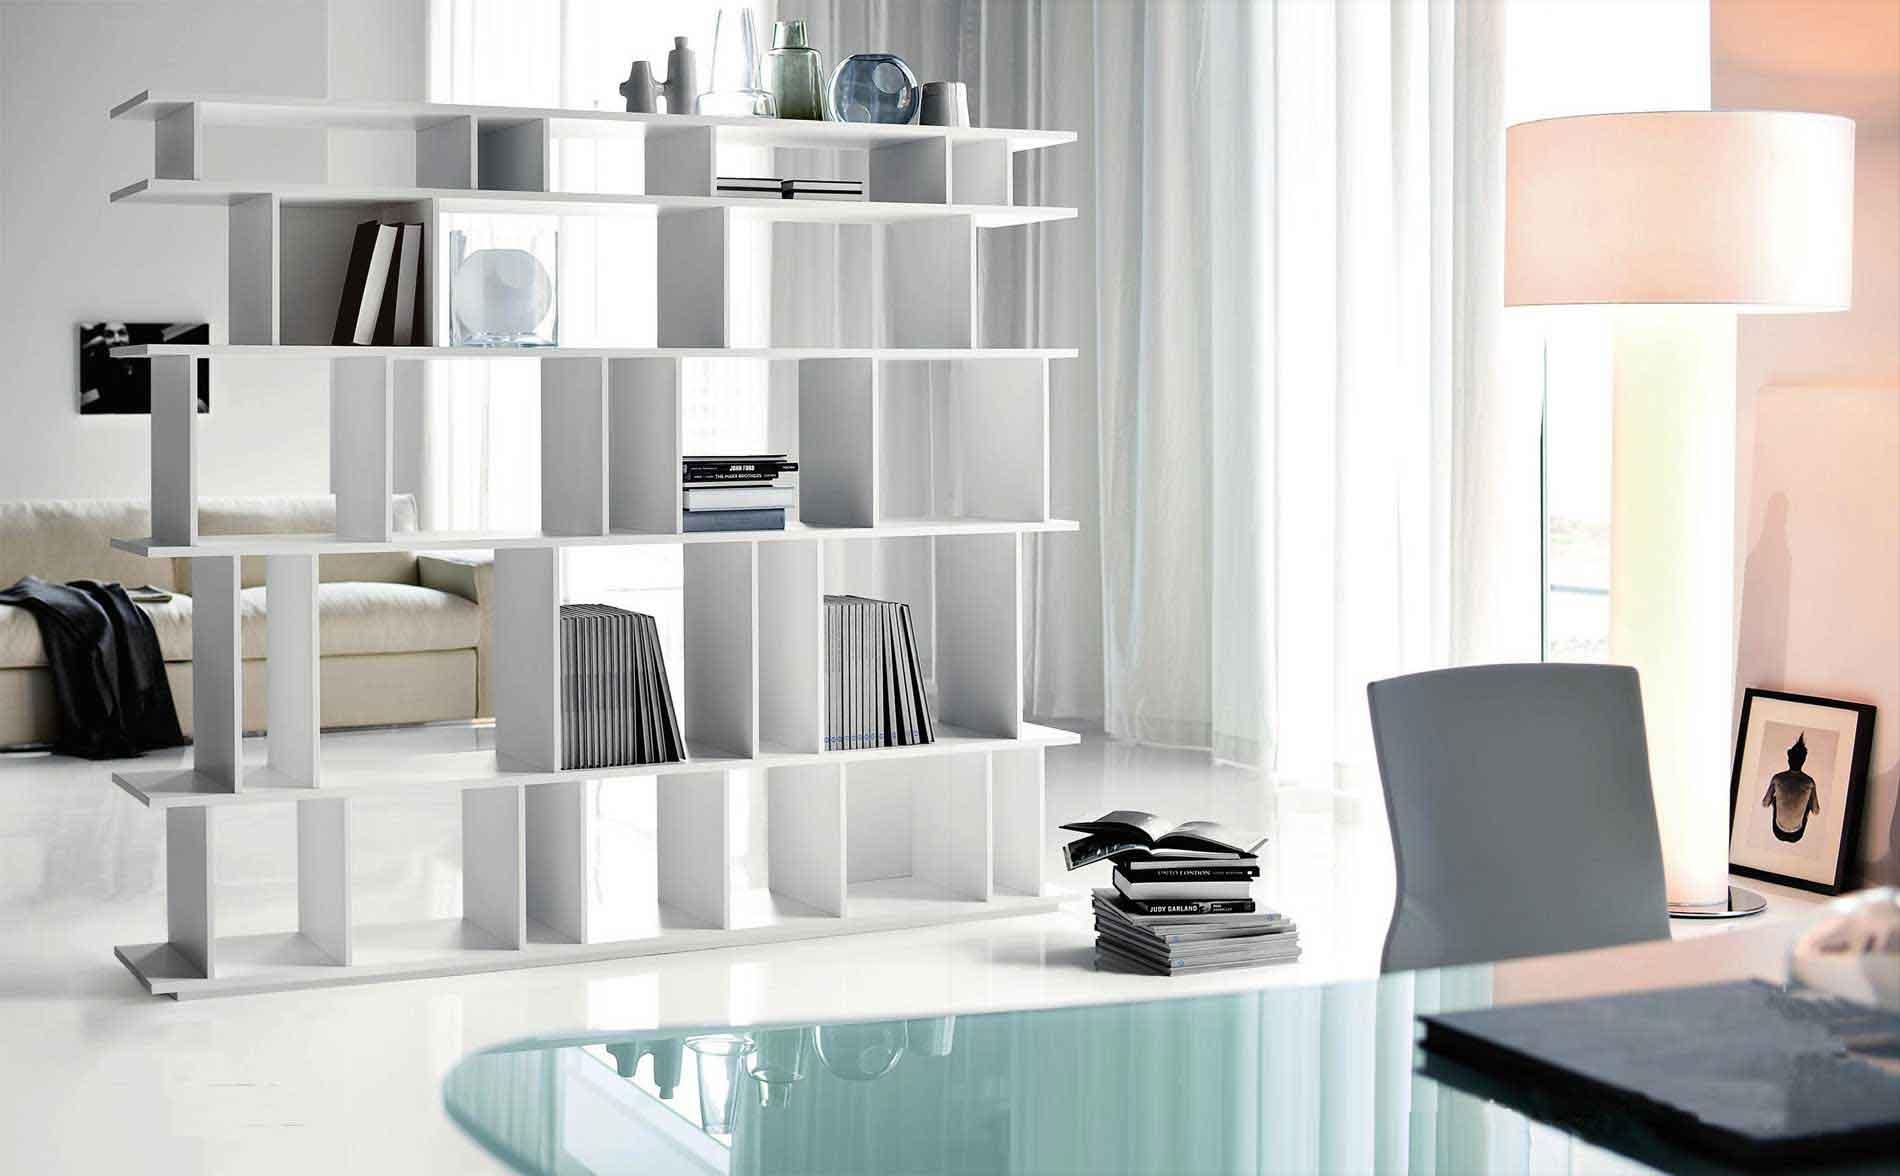 10 Unique bookshelves that will blow your mind | Interior Design ...